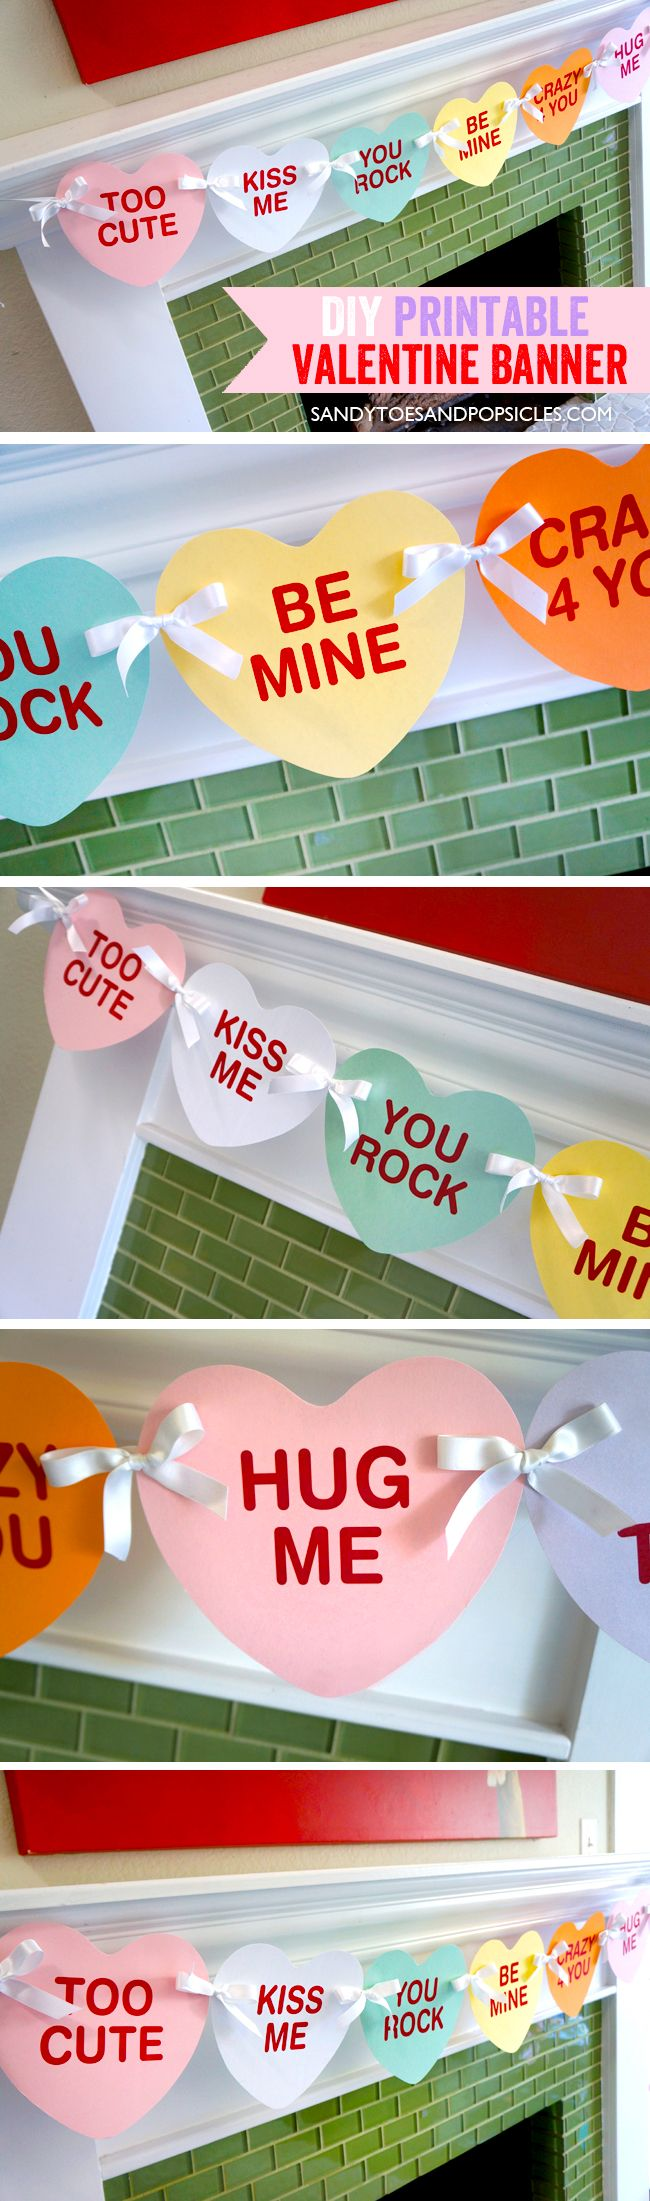 a547a972ade099102c7e7ea716ec07cb valentine decorations valentine ideas - DIY Valentine's Day Banner. Free Printable Valentine decoration.